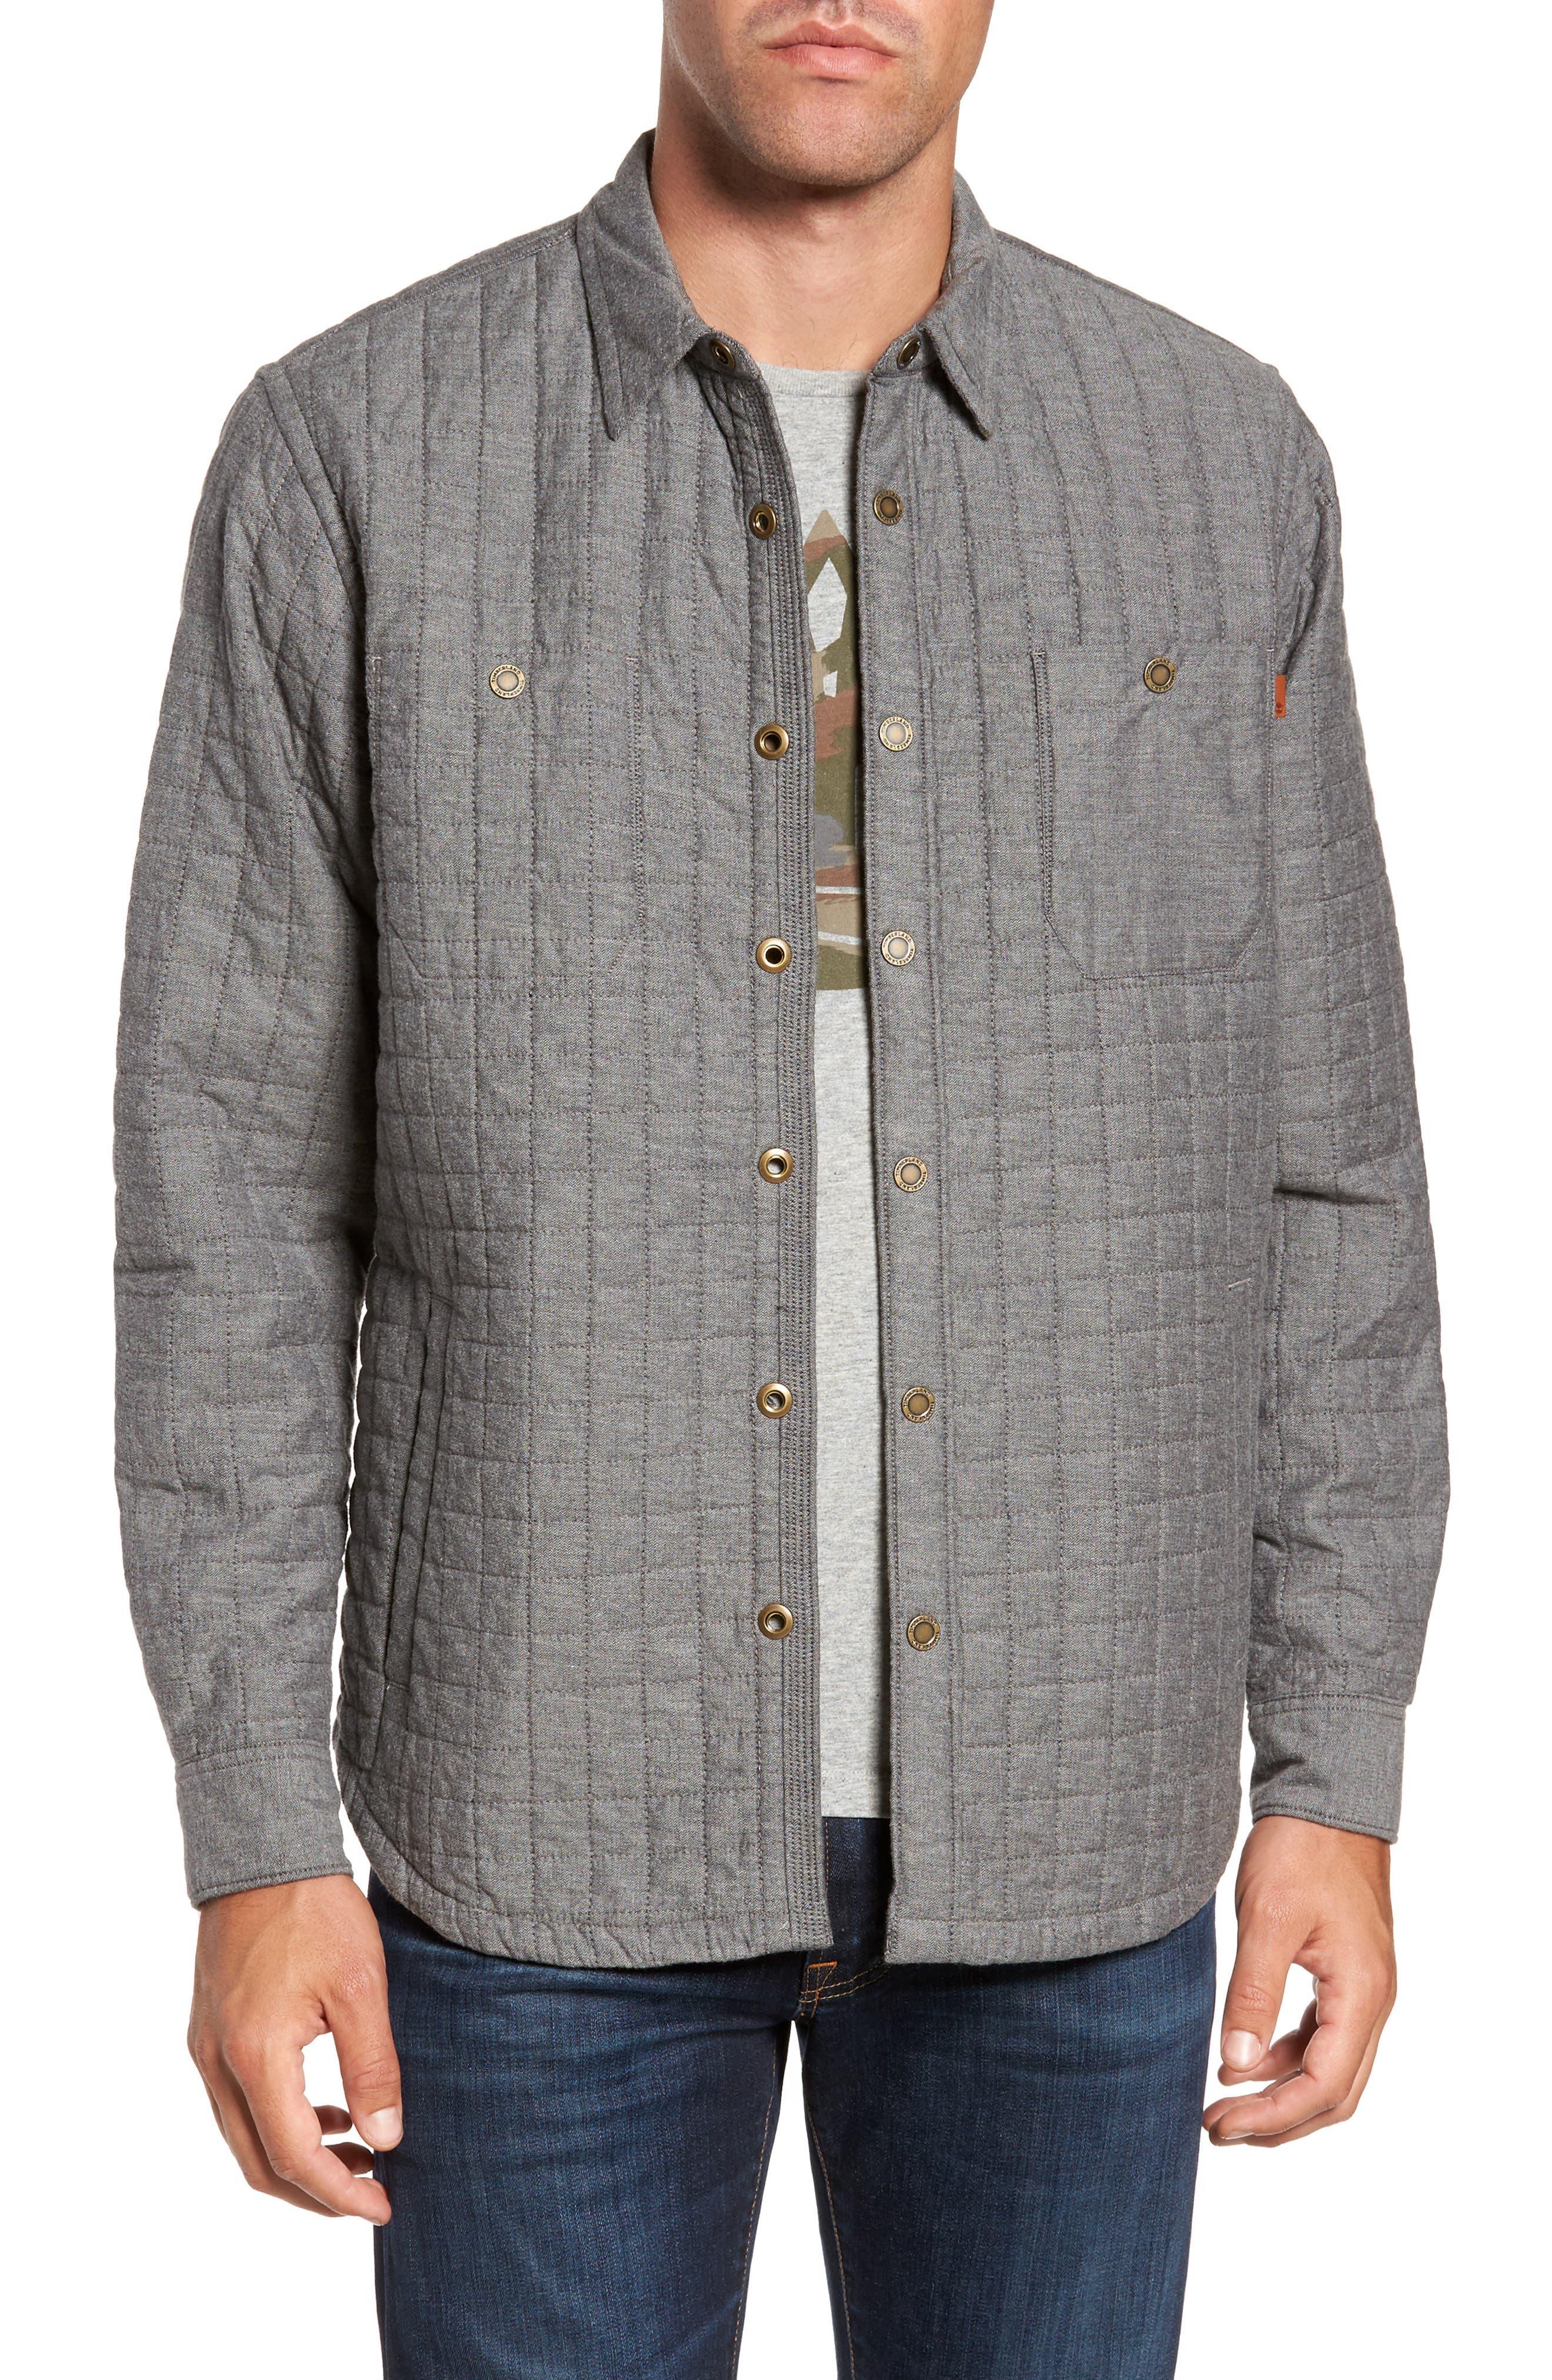 Gunstock River Lightweight Quilted Shirt Jacket,                         Main,                         color, Grey